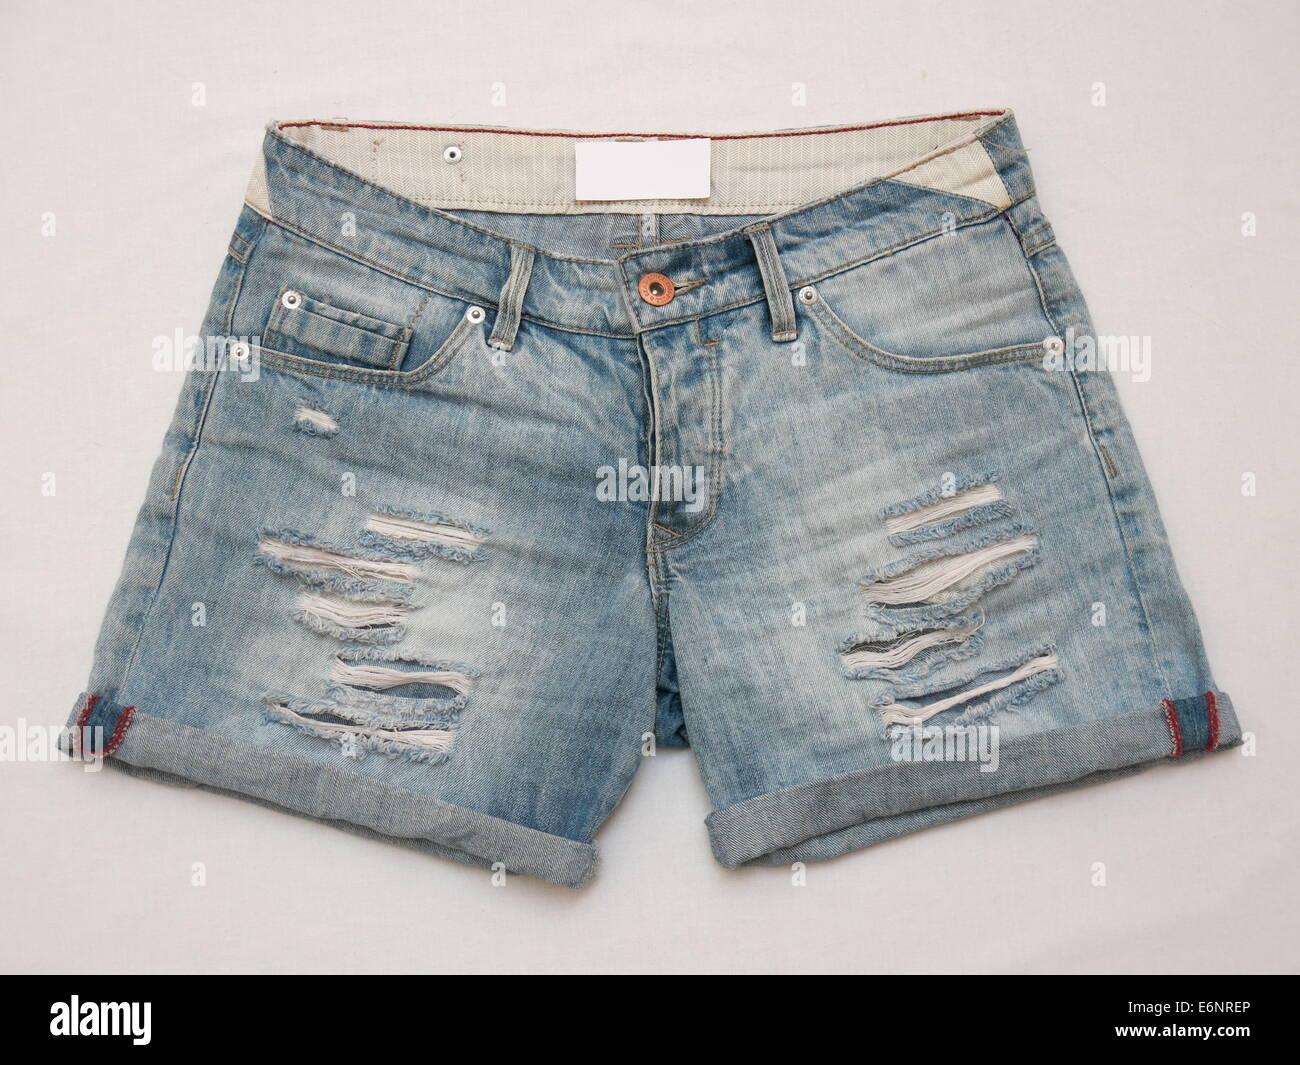 Pair of female shorts isolated against white background Stock Photo